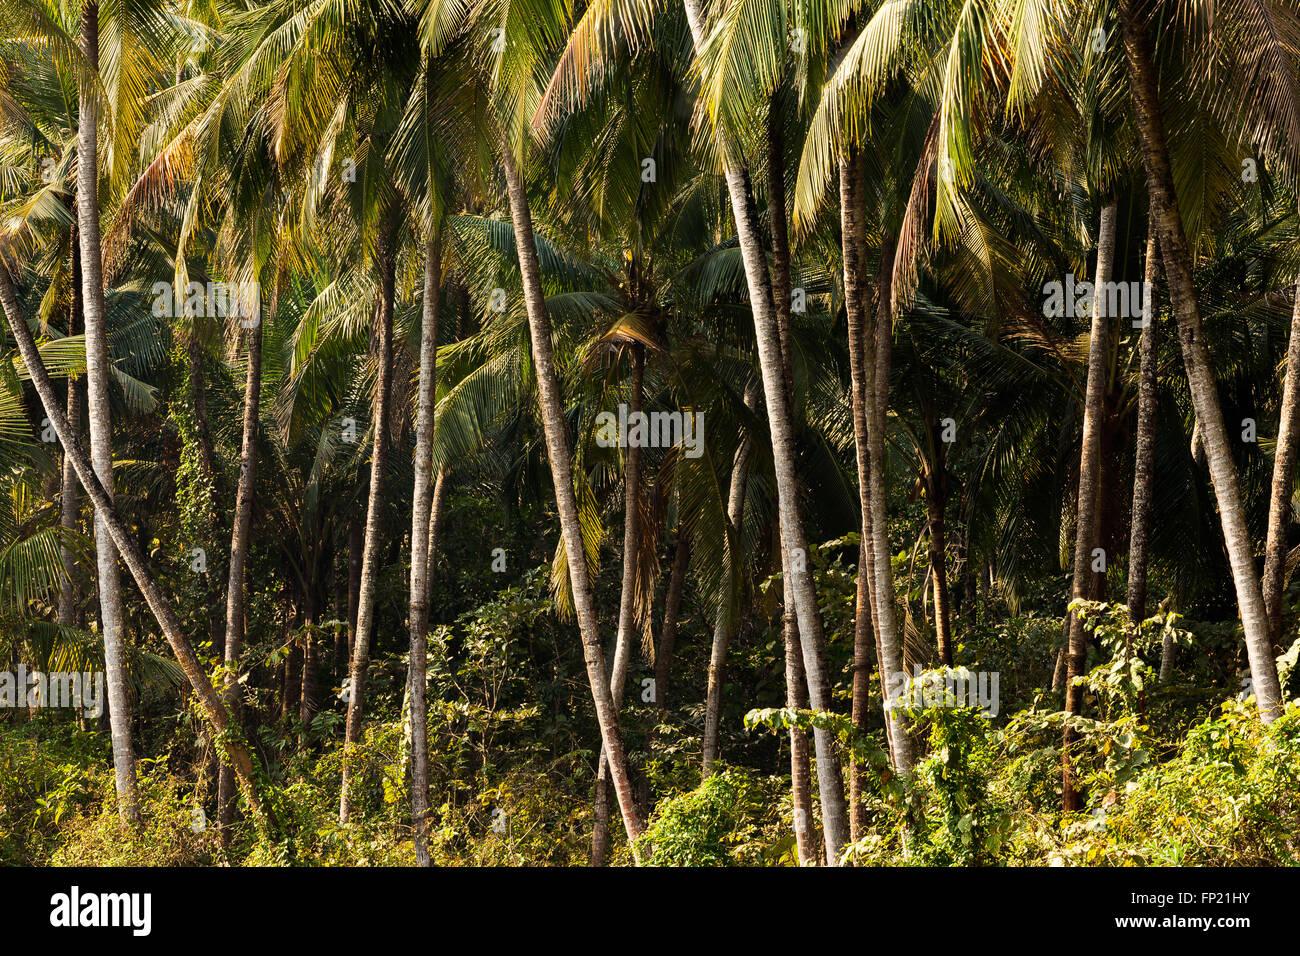 coconut tree jungle - Stock Image